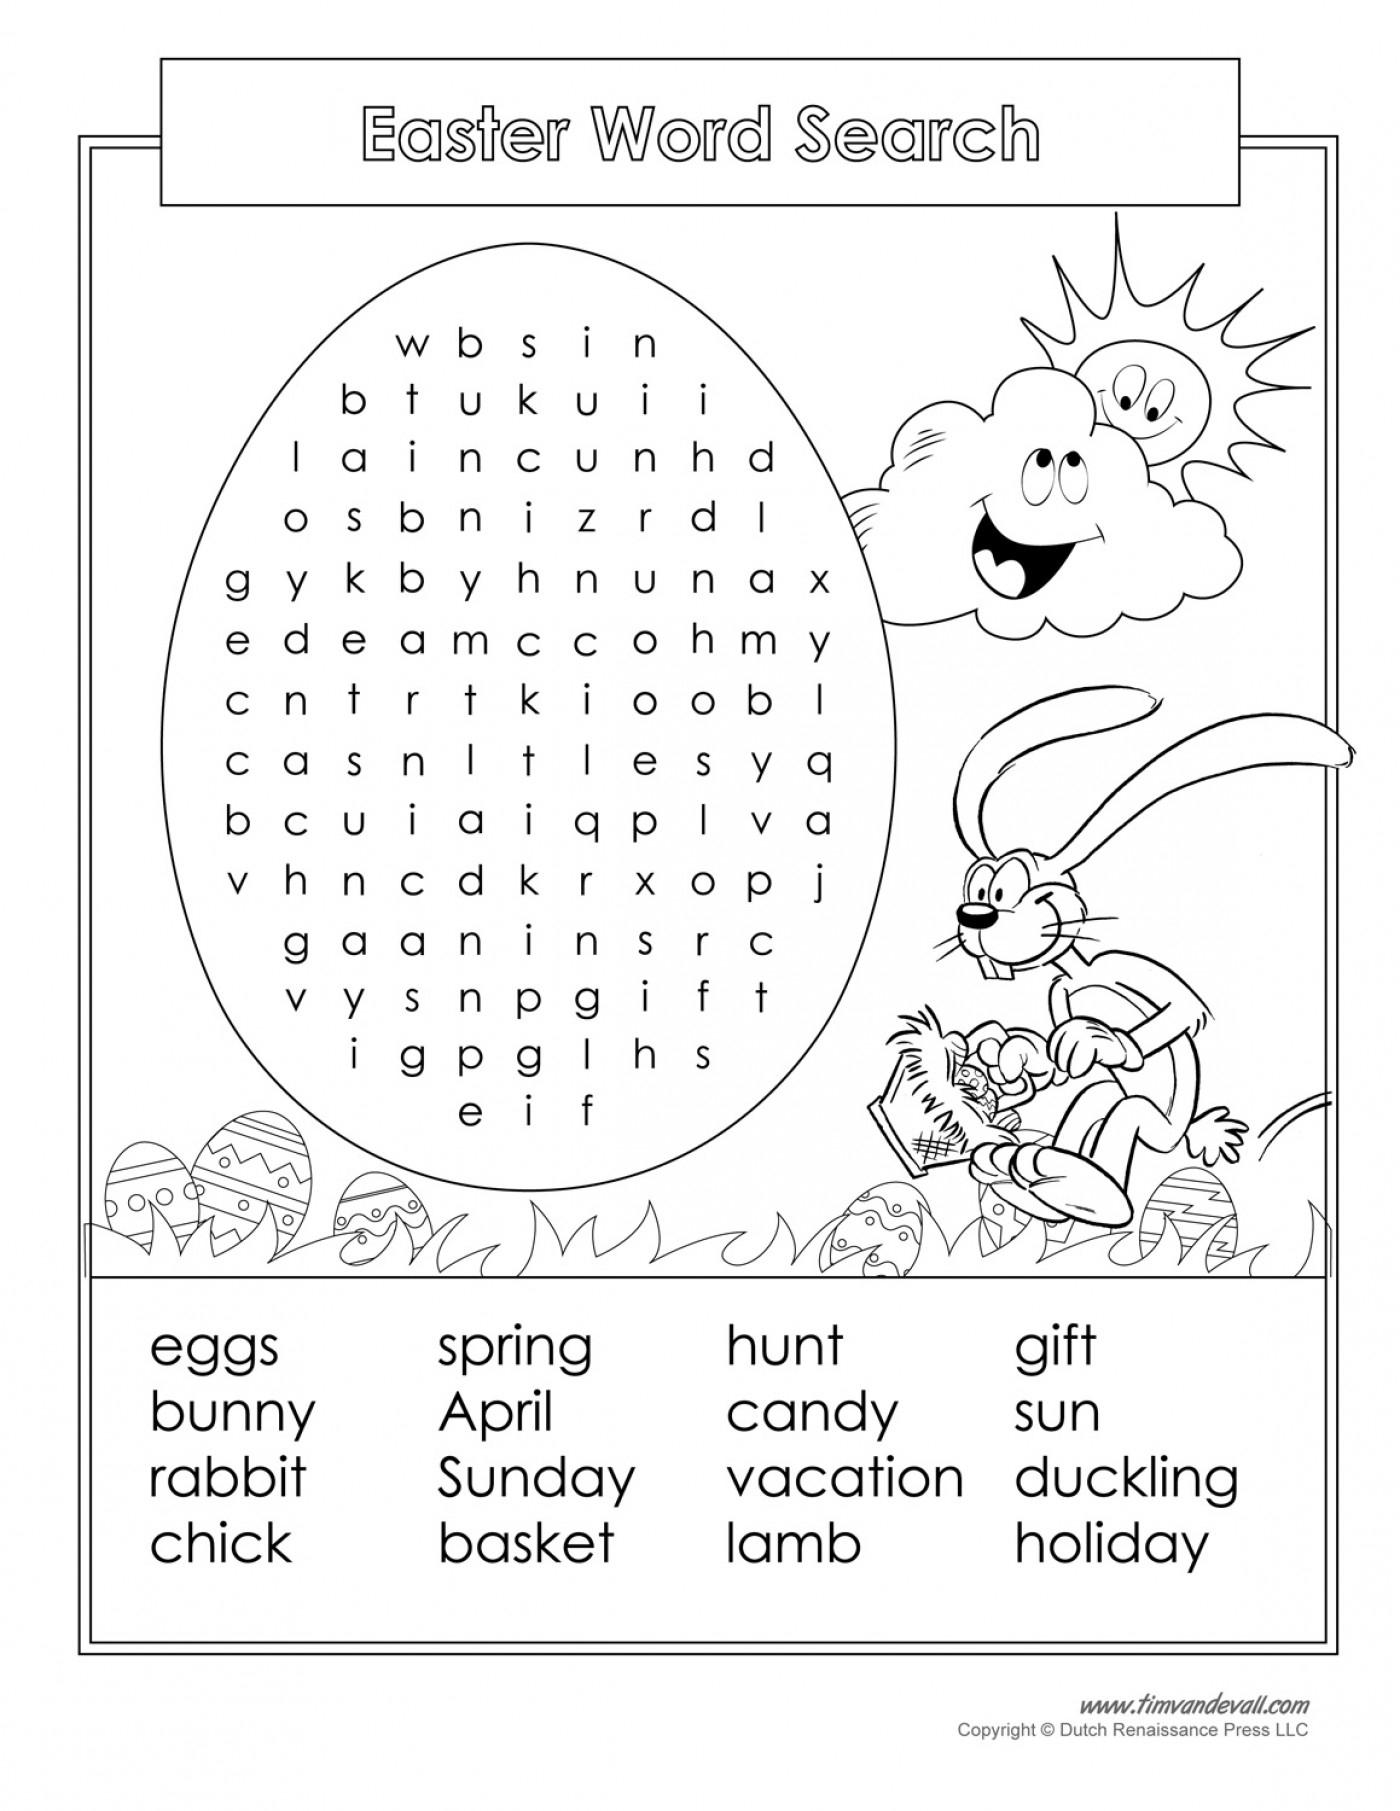 Easter Crossword Puzzle Printable Crosswords Free Word - Free Printable Easter Puzzles For Adults